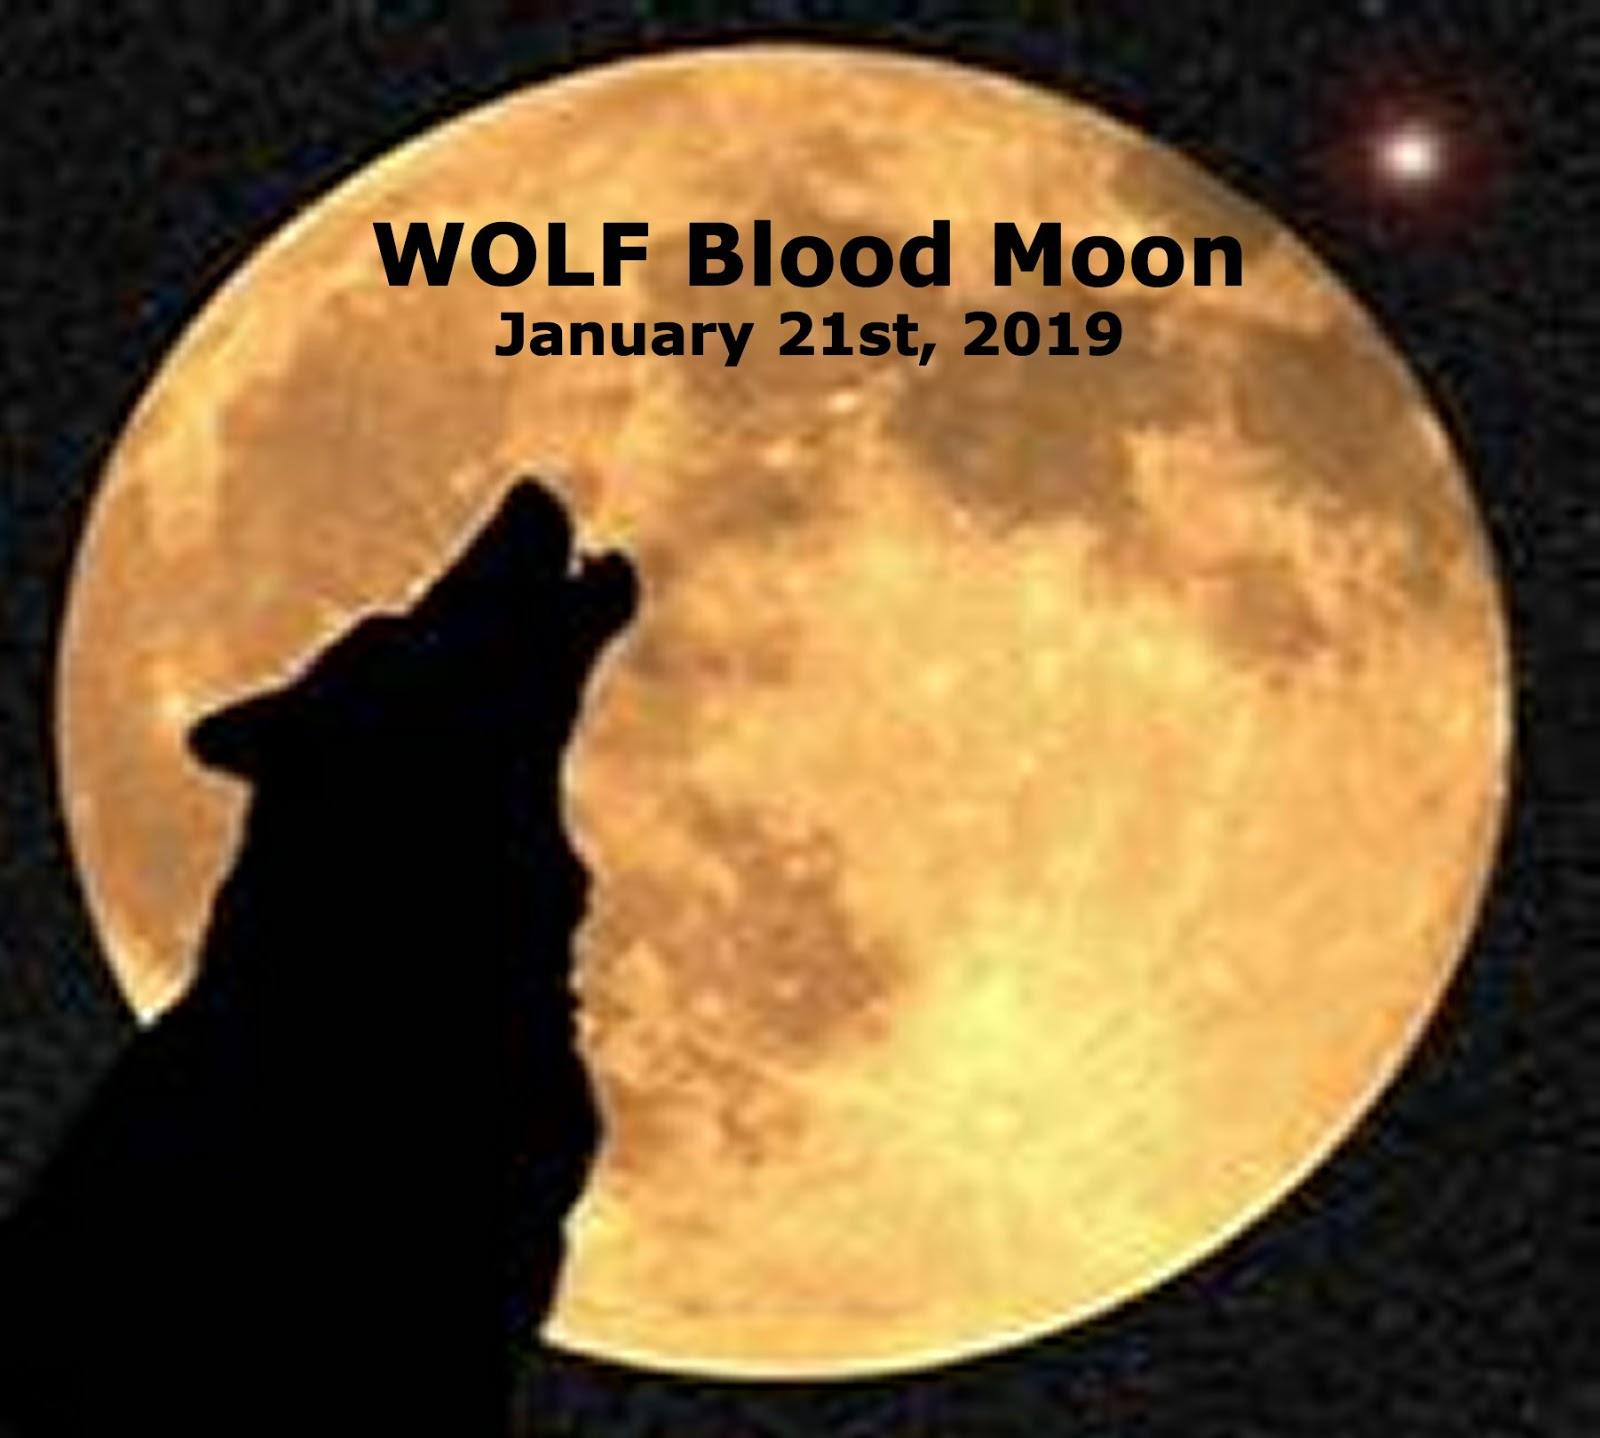 blood moon january 2019 spiritual - photo #35